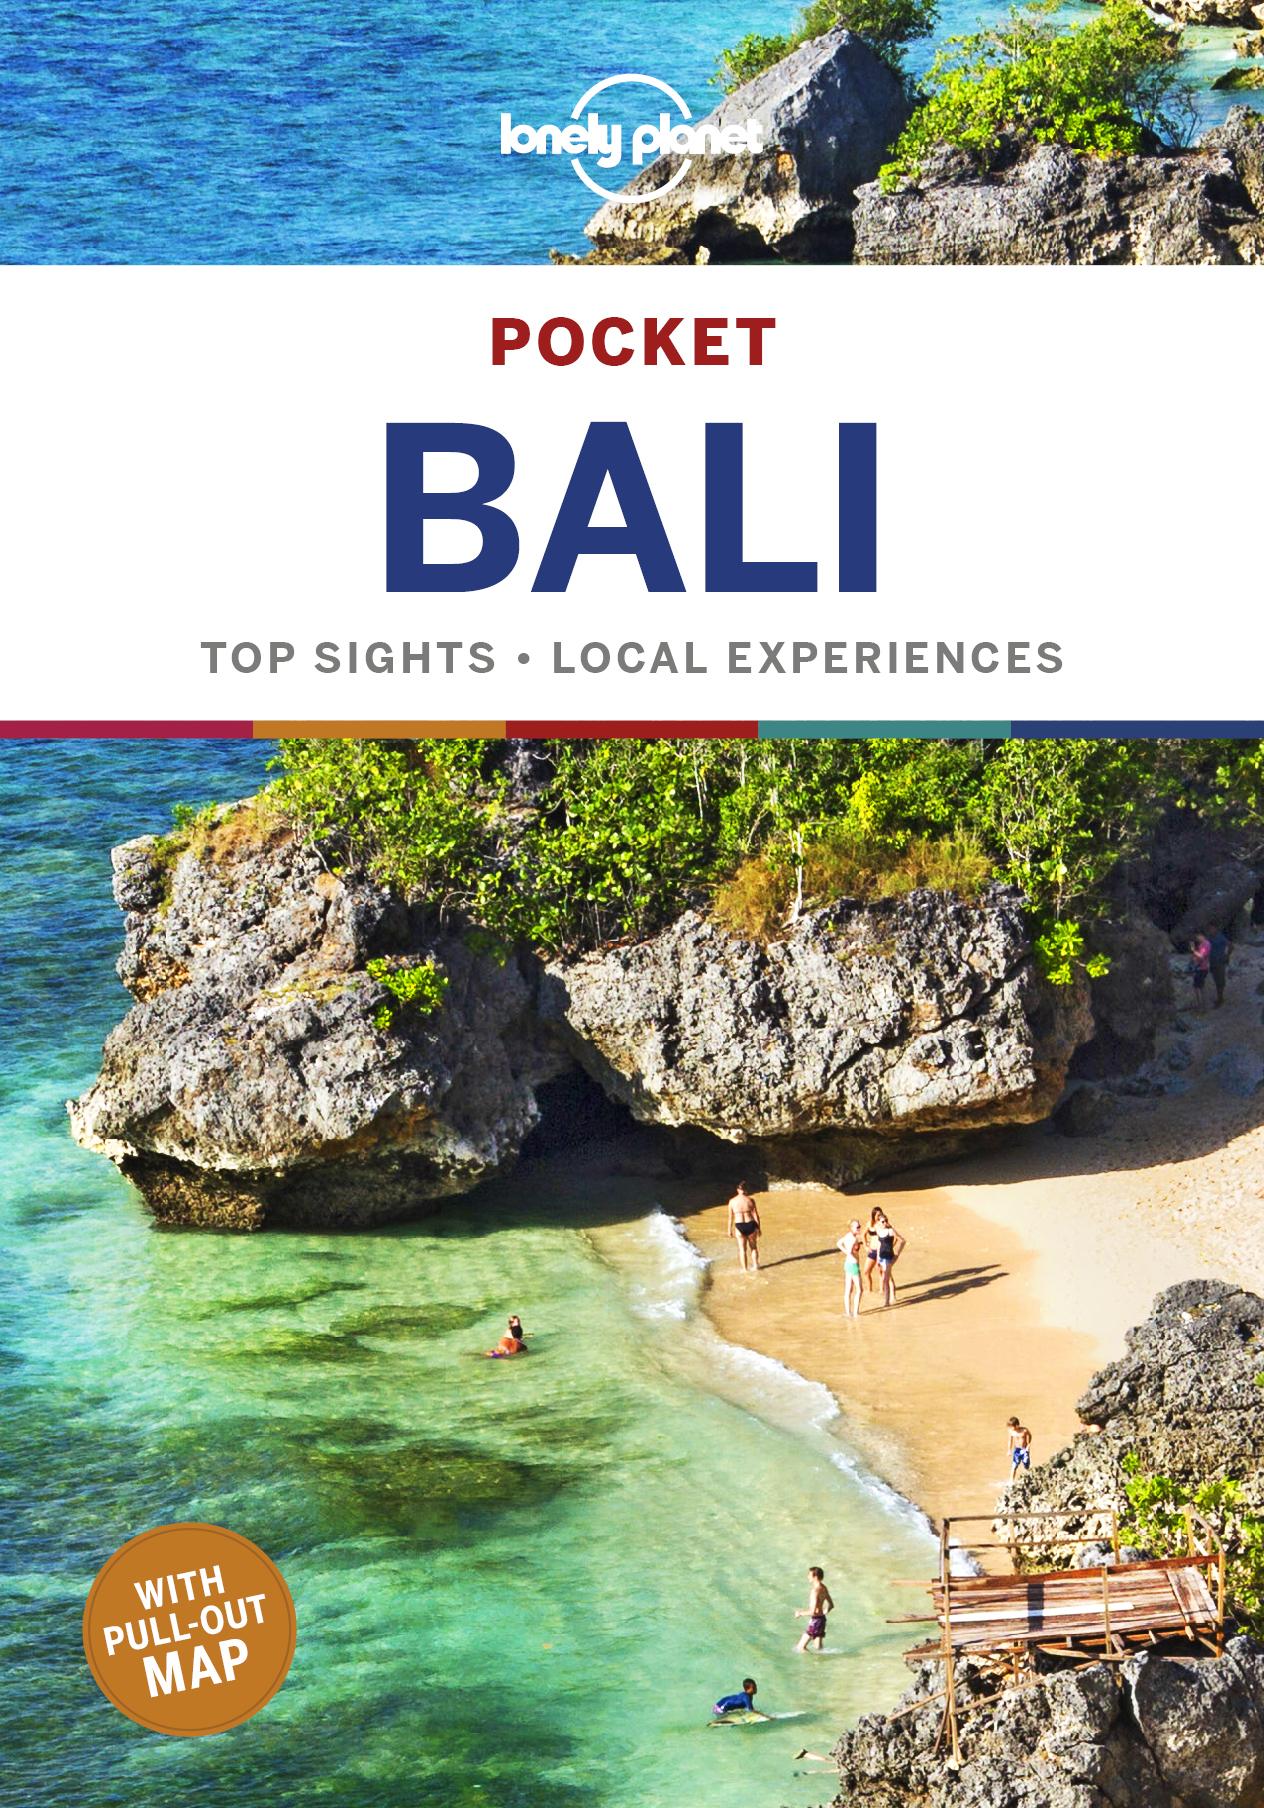 Reisgids Pocket Bali | Lonely Planet <br/>€ 11.95 <br/> <a href='https://www.dezwerver.nl/reisgidsen/?tt=1554_252853_241358_&r=https%3A%2F%2Fwww.dezwerver.nl%2Fr%2Fazie%2Findonesie%2Fbali%2Fc%2Fboeken%2Freisgidsen%2F9781786578471%2Freisgids-pocket-bali-lonely-planet%2F' target='_blank'>Meer Info</a>